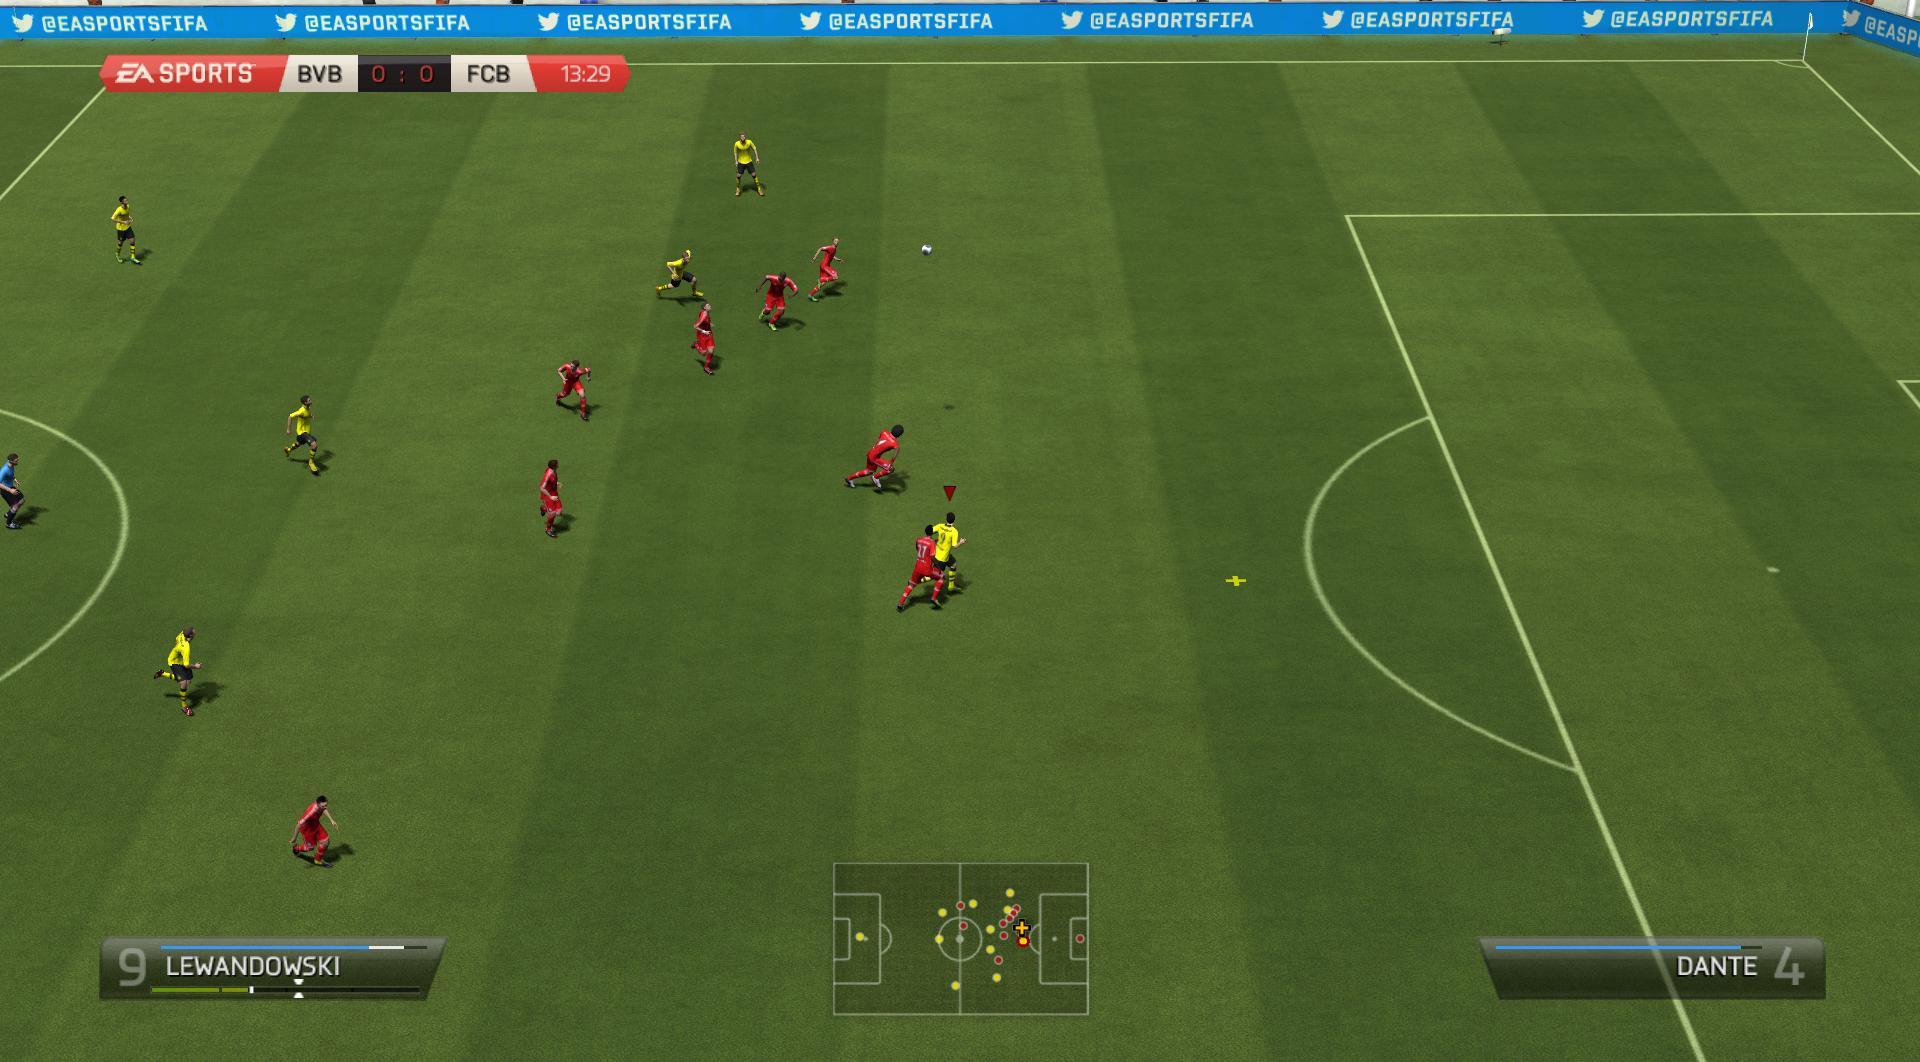 Fifa 14 - мечта дирижера